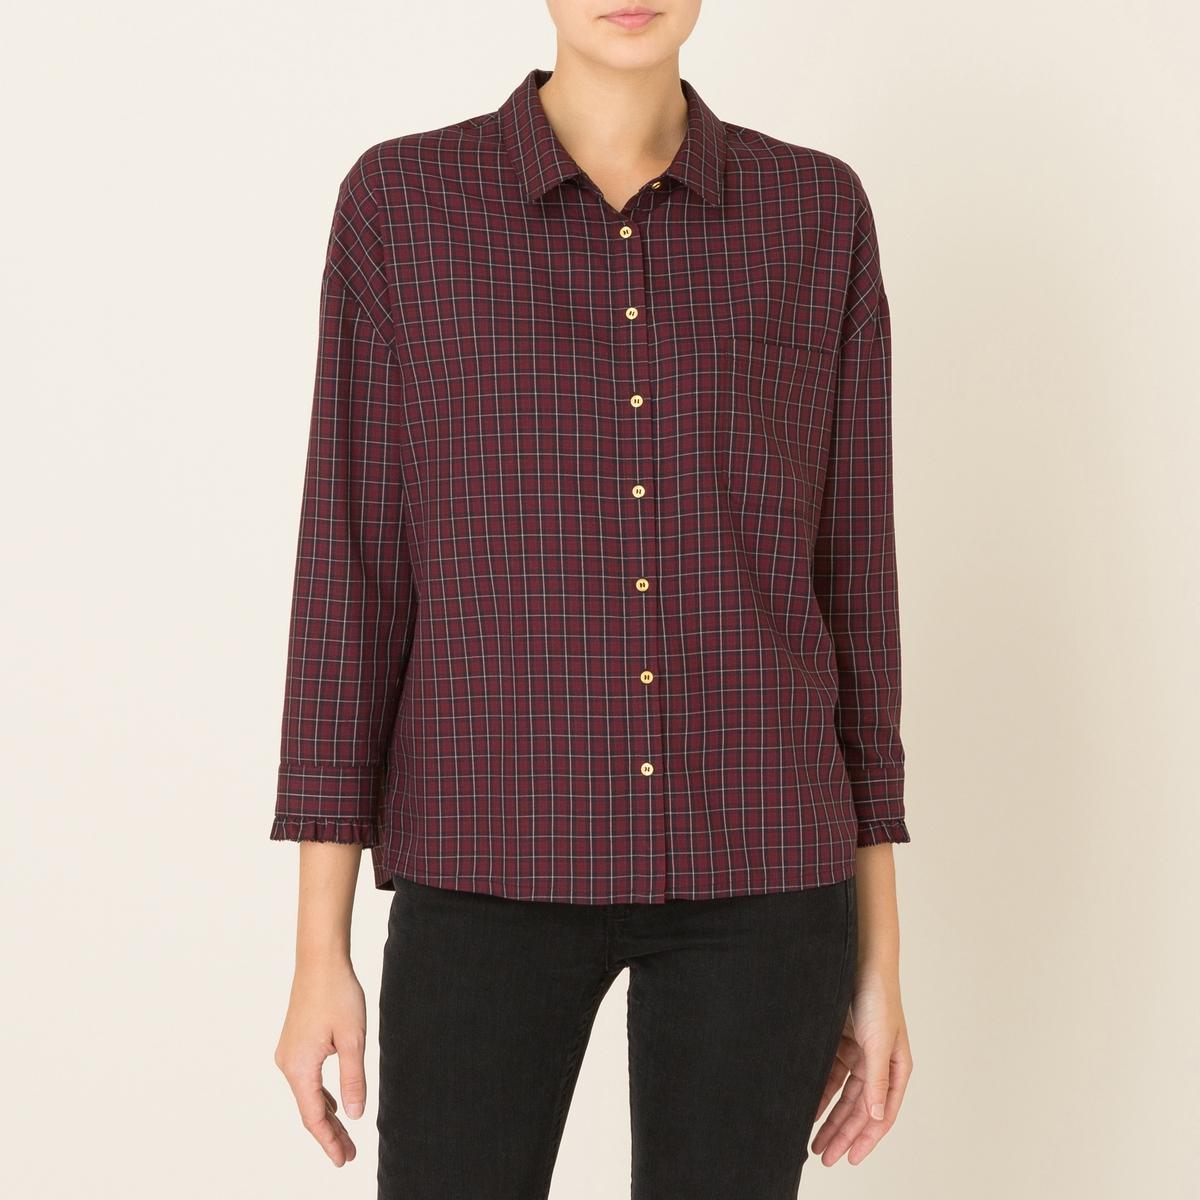 Рубашка женская HALI женская рубашка feelroom